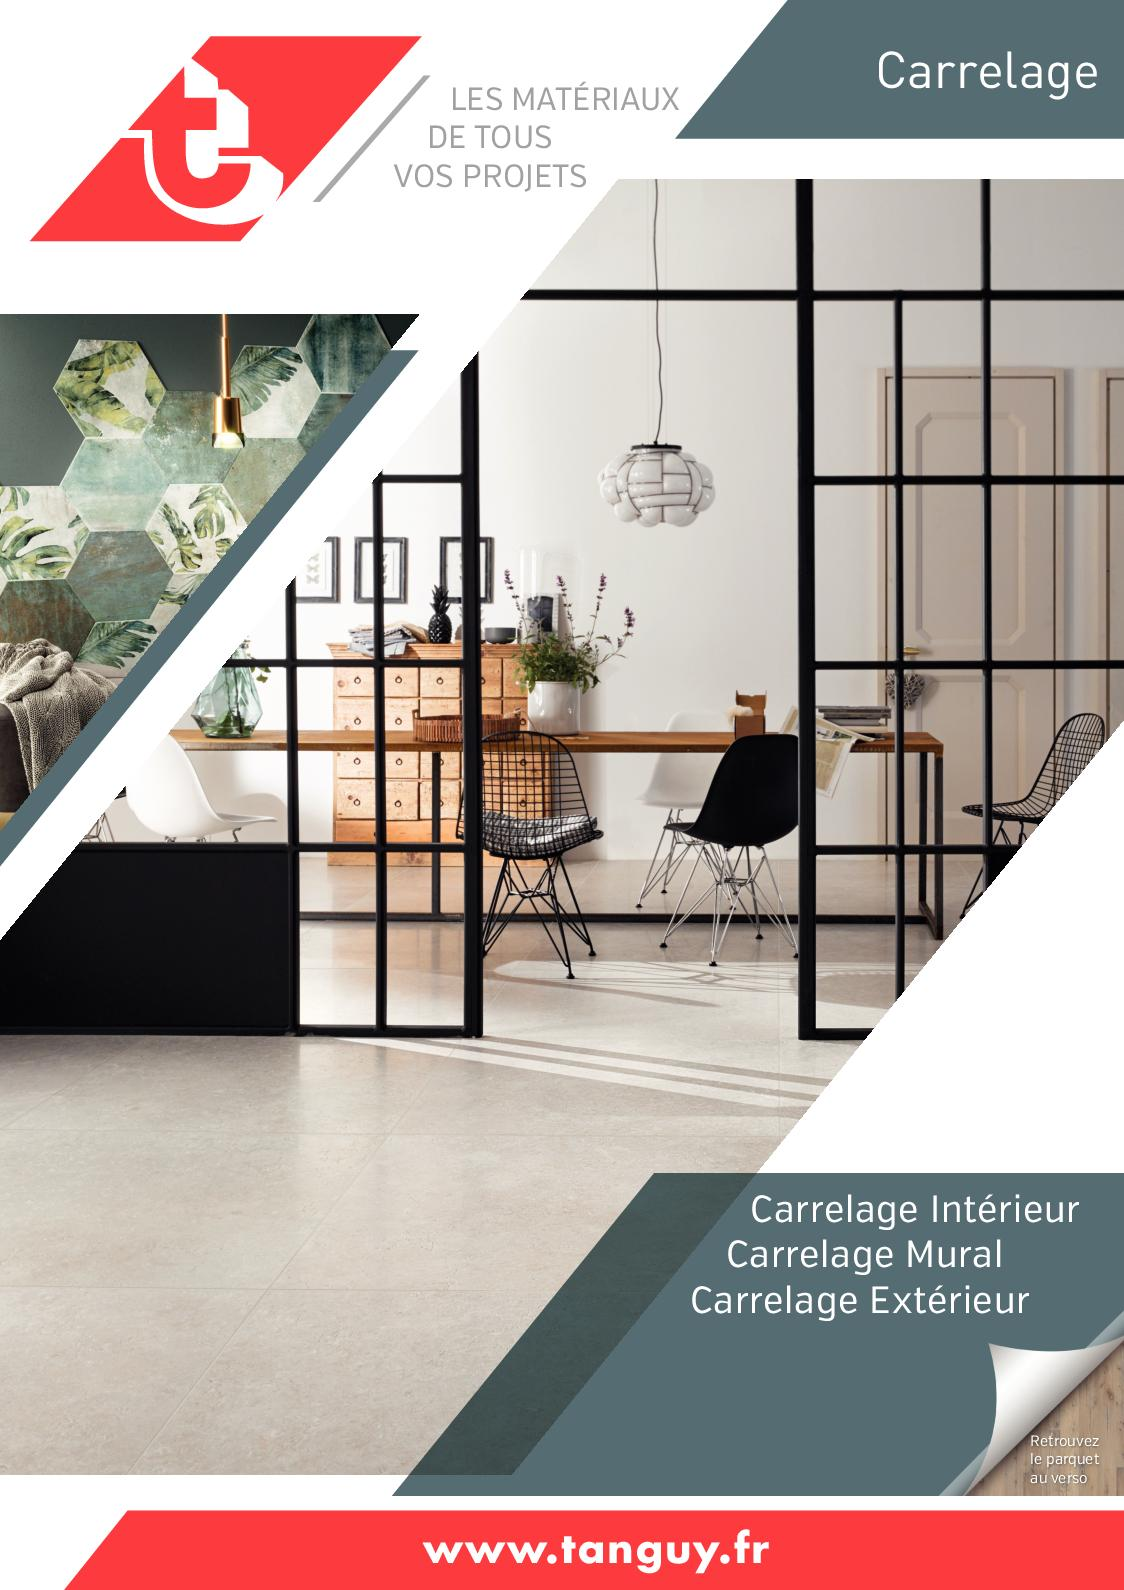 Carrelage Imitation Parquet 30X60 calaméo - catalogue carrelage